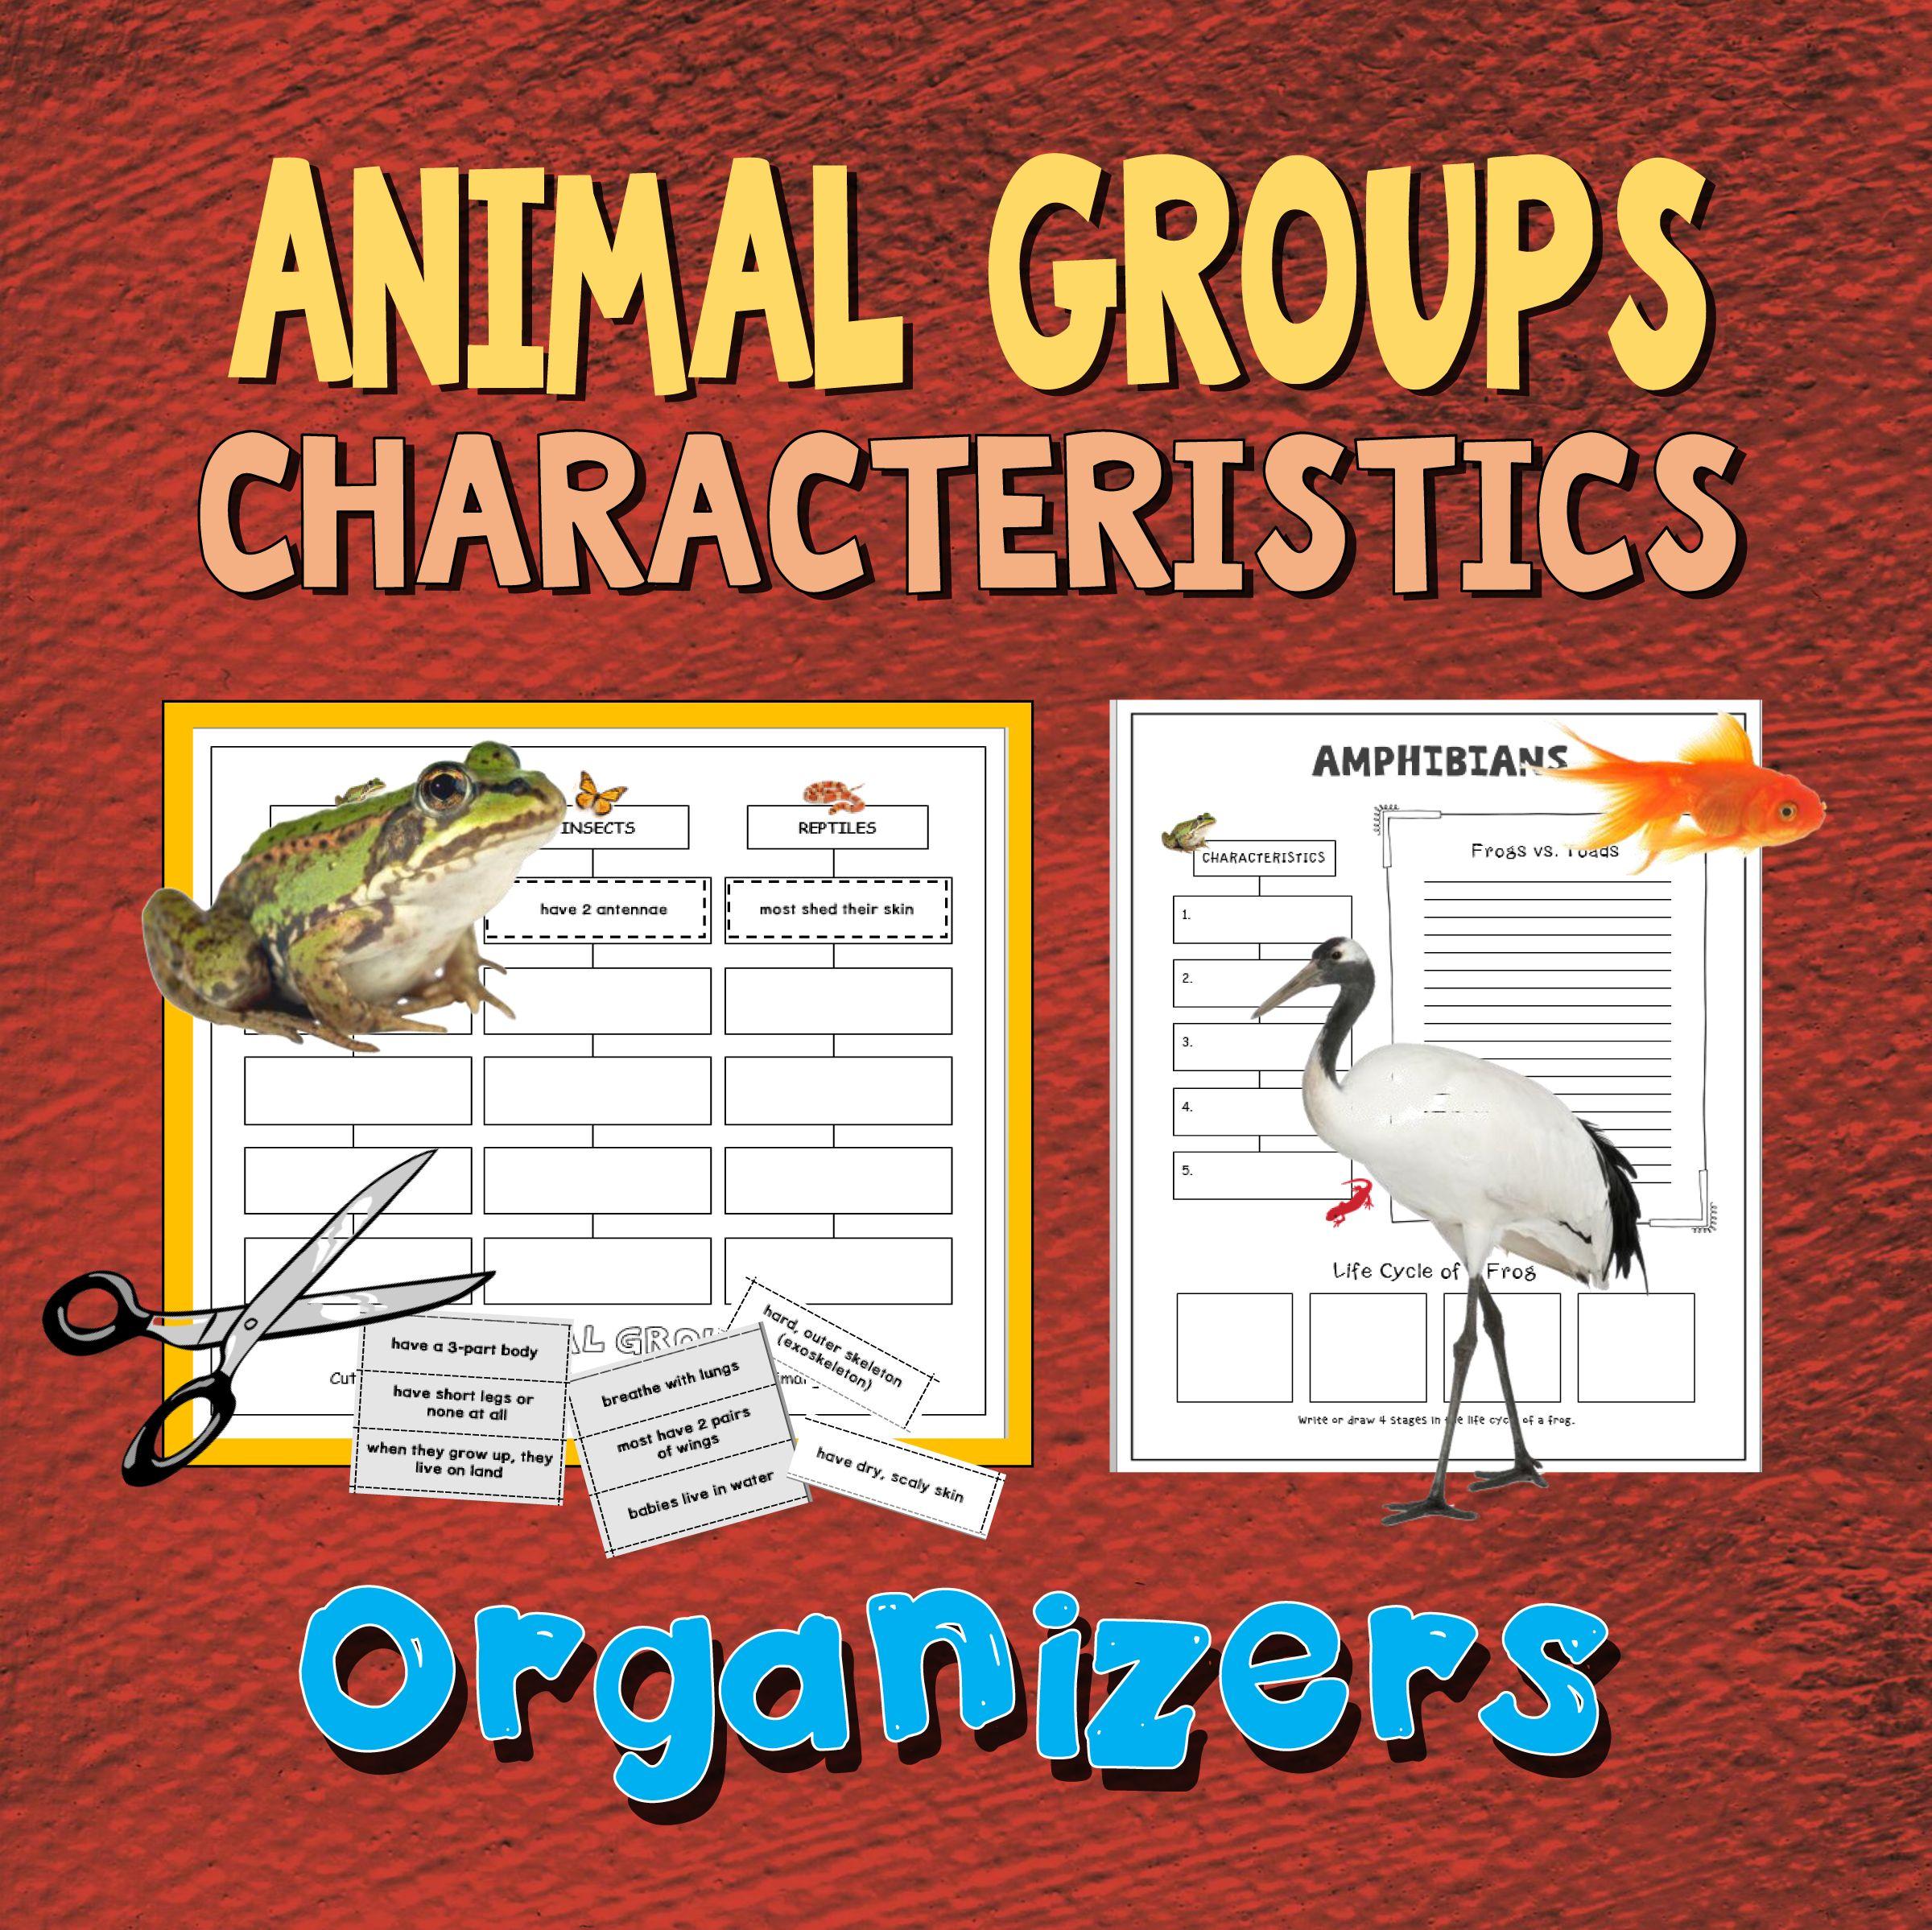 Animal Groups Characteristics